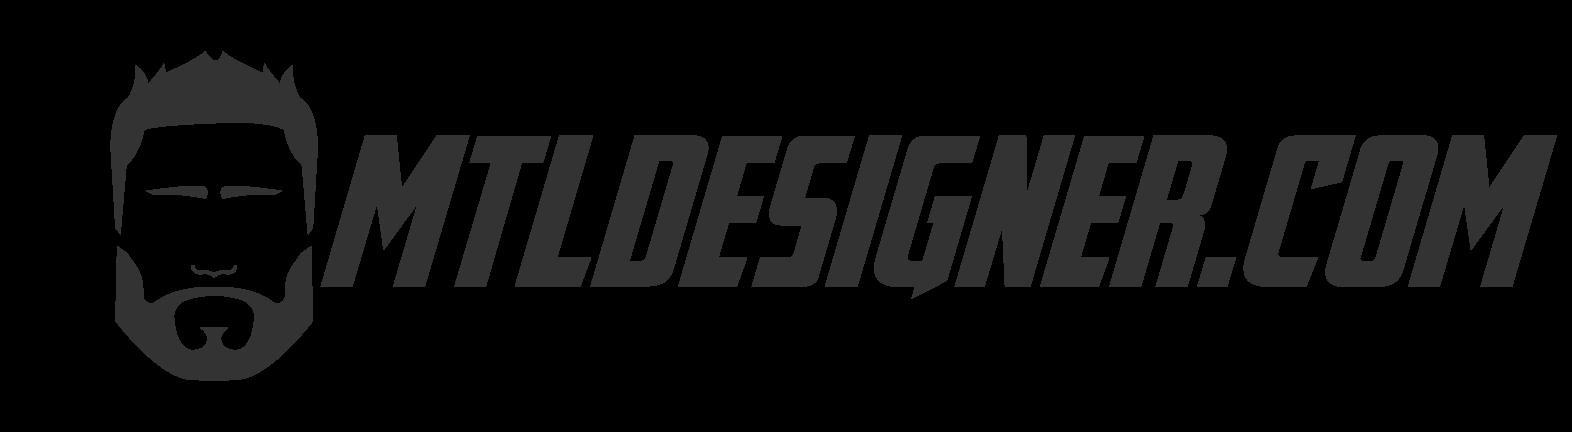 mtldesigner.com